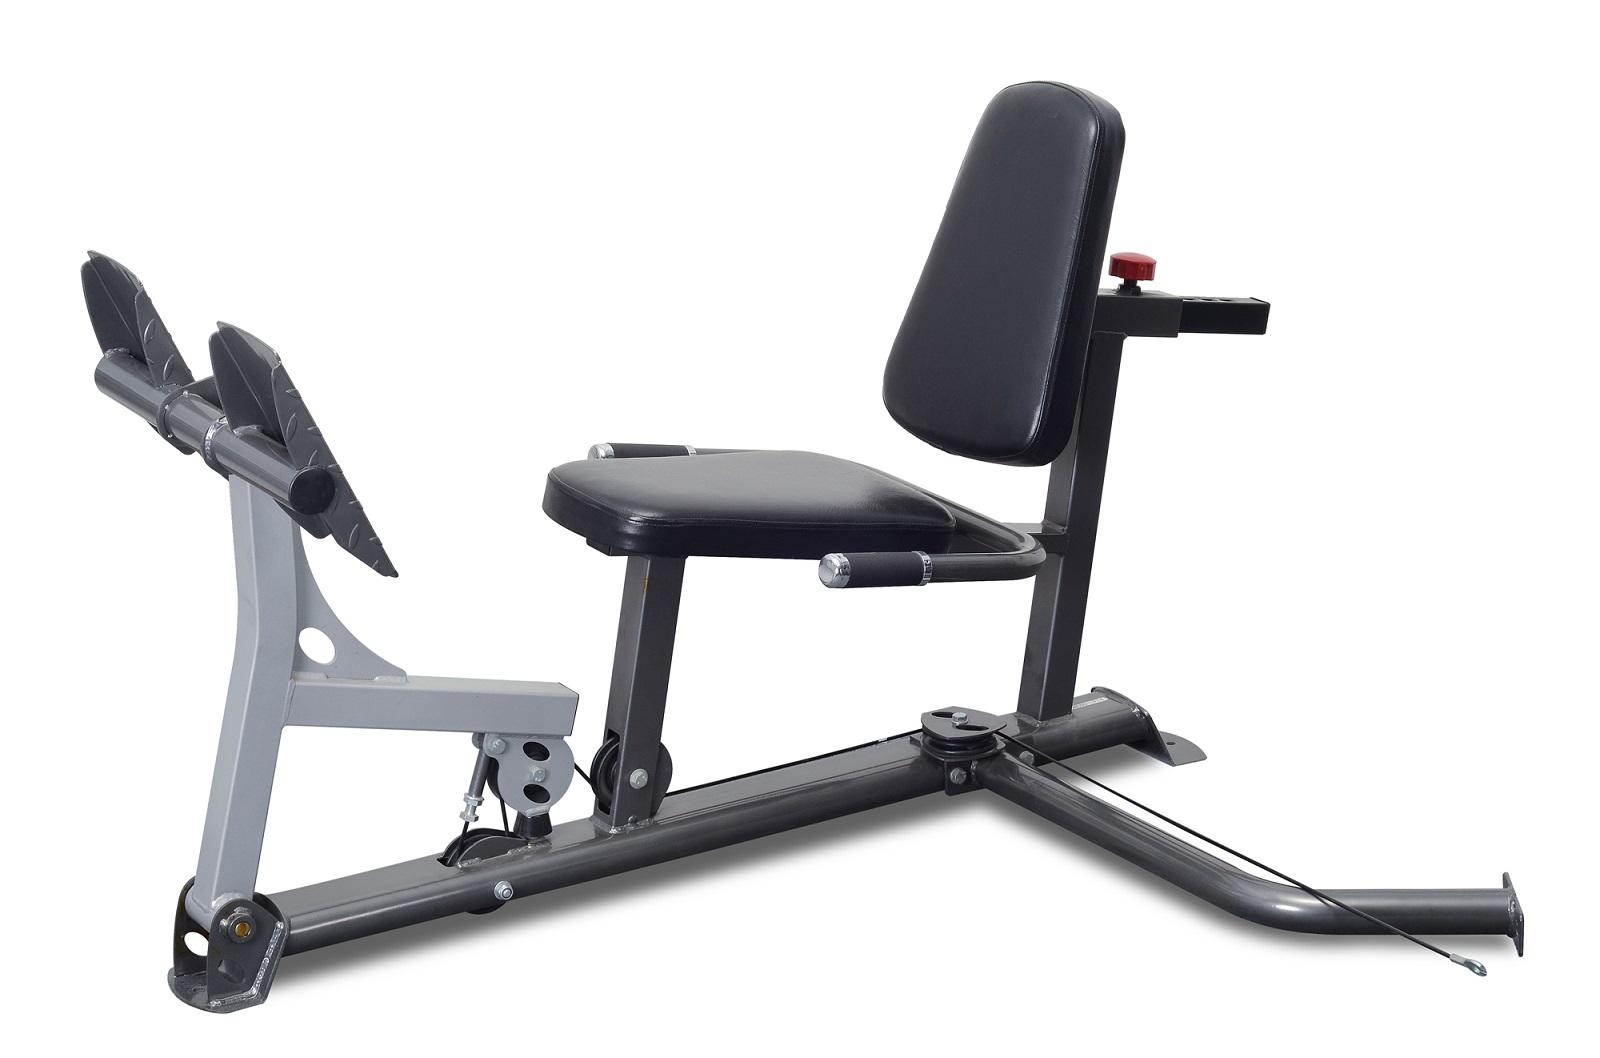 REVOLUTION C80 HOME GYM WITH LEG PRESS - Revolution Fitness